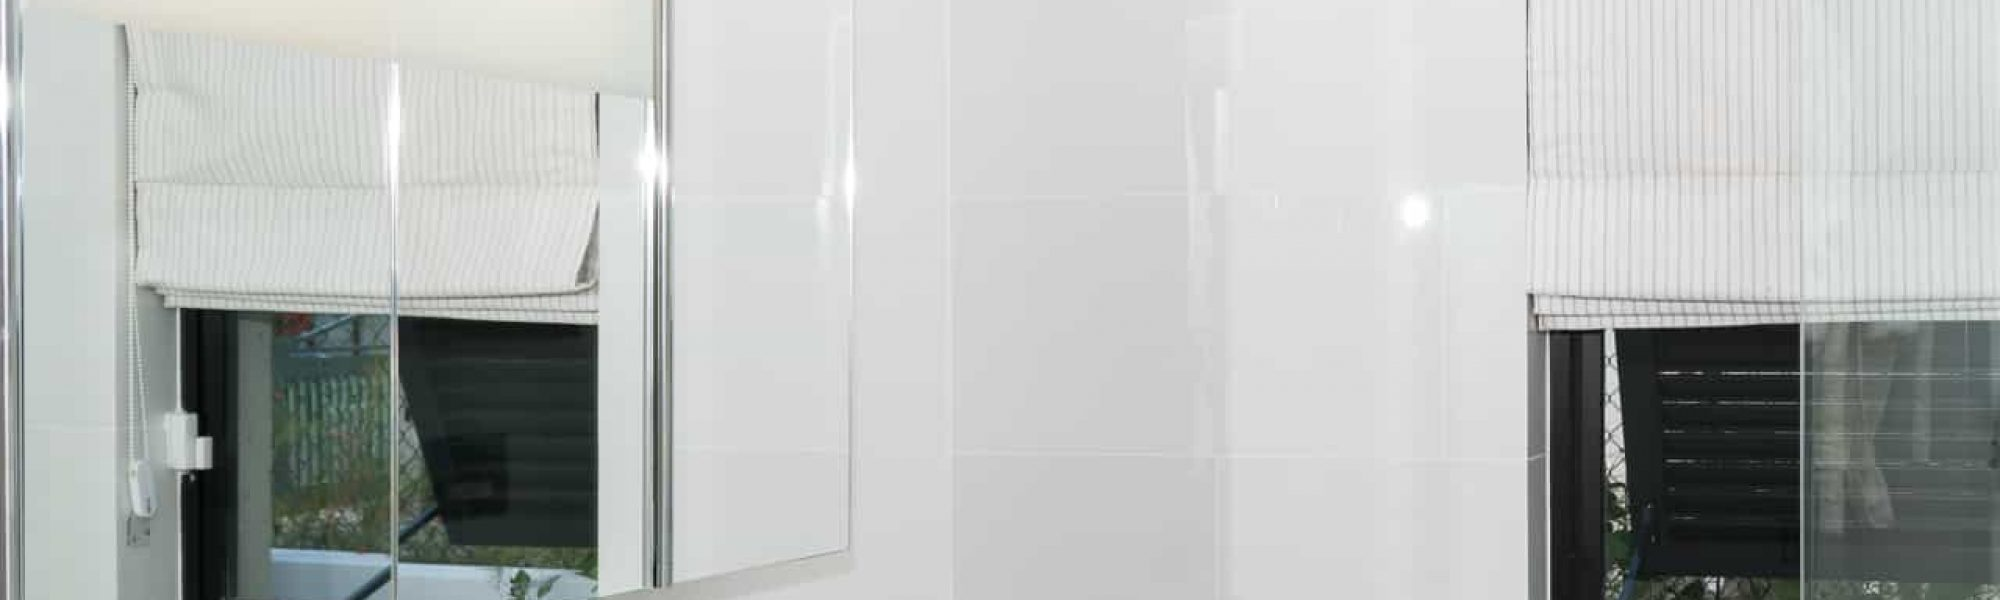 46 bathroom details low res